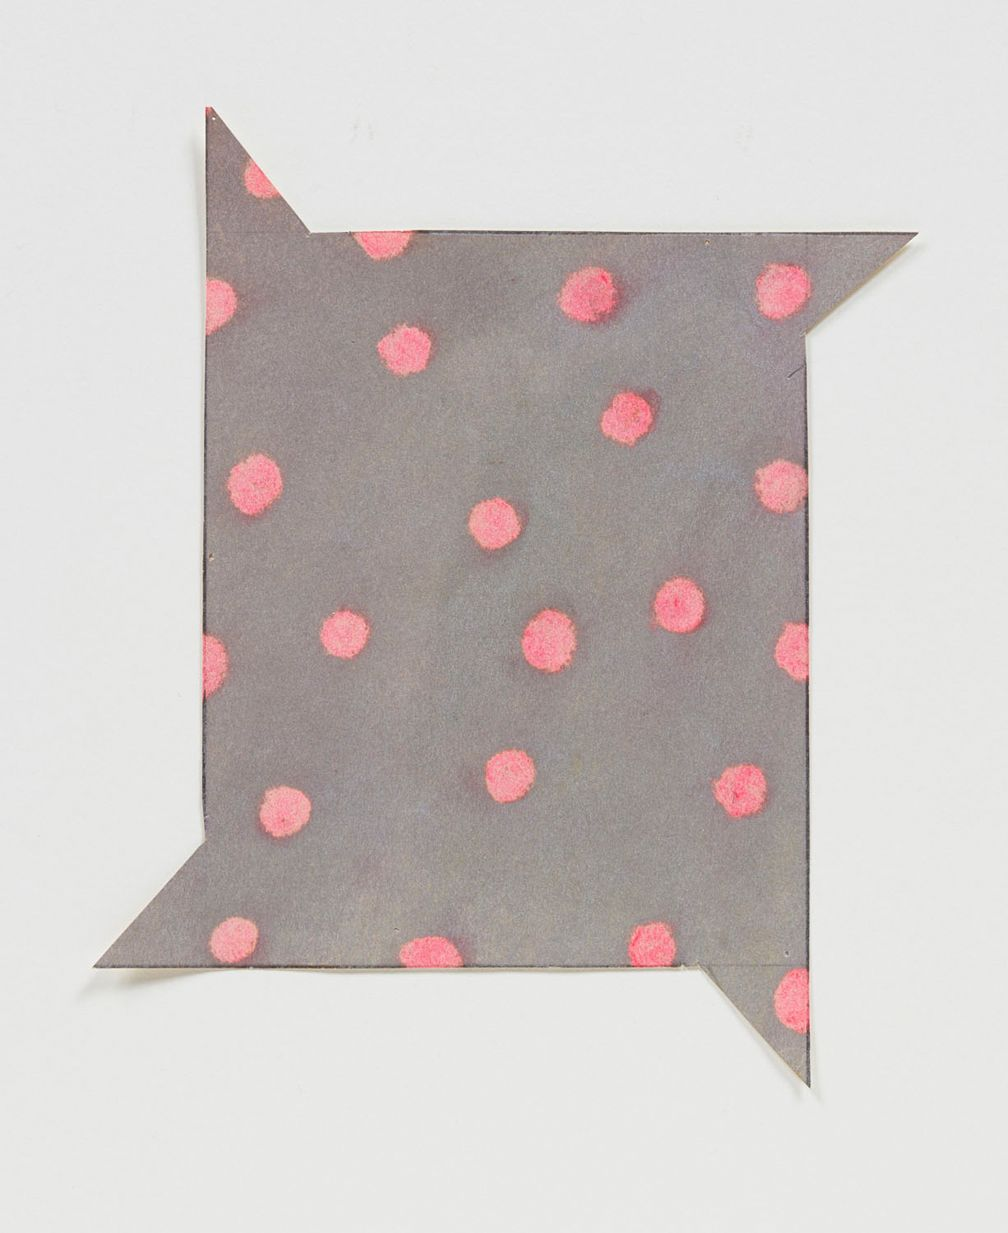 Jeremy Moon, Untitled (Study fpr Starlight Hour),1965